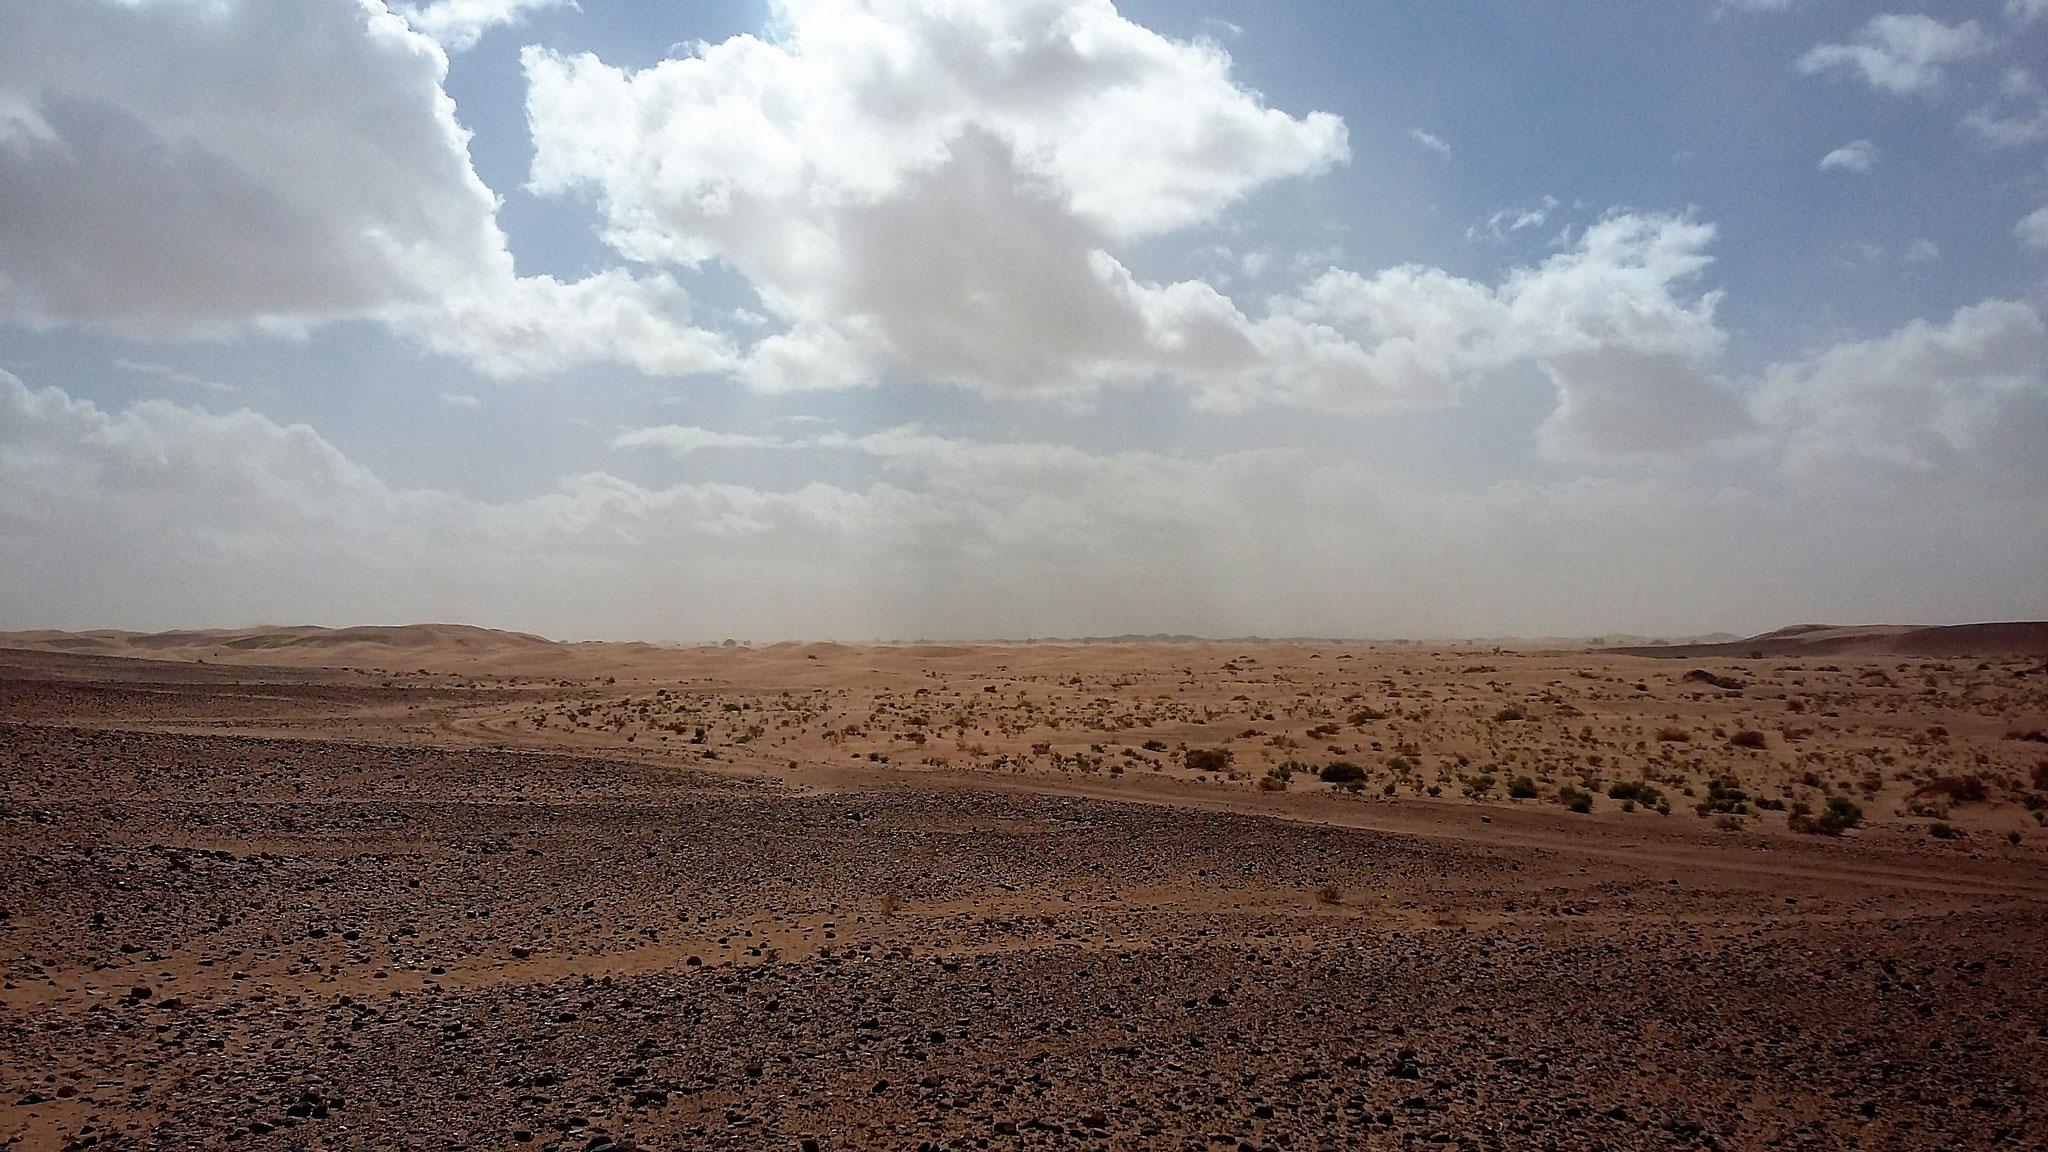 Das Dünengebiet Erg Chegaga liegt vor uns.